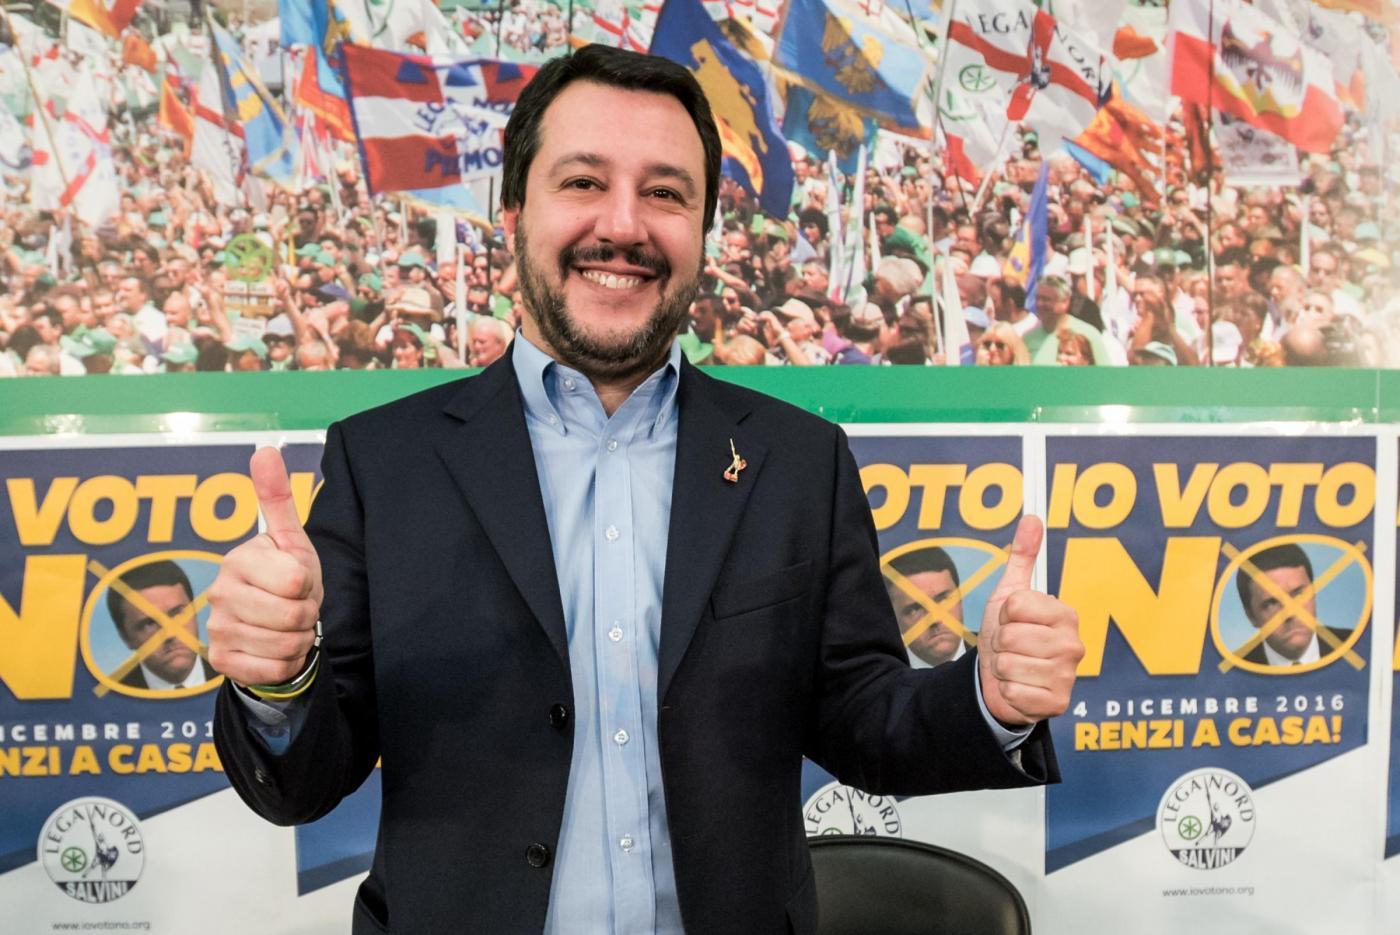 Conferenza di Matteo Salvini su risultati referendum costituzionale